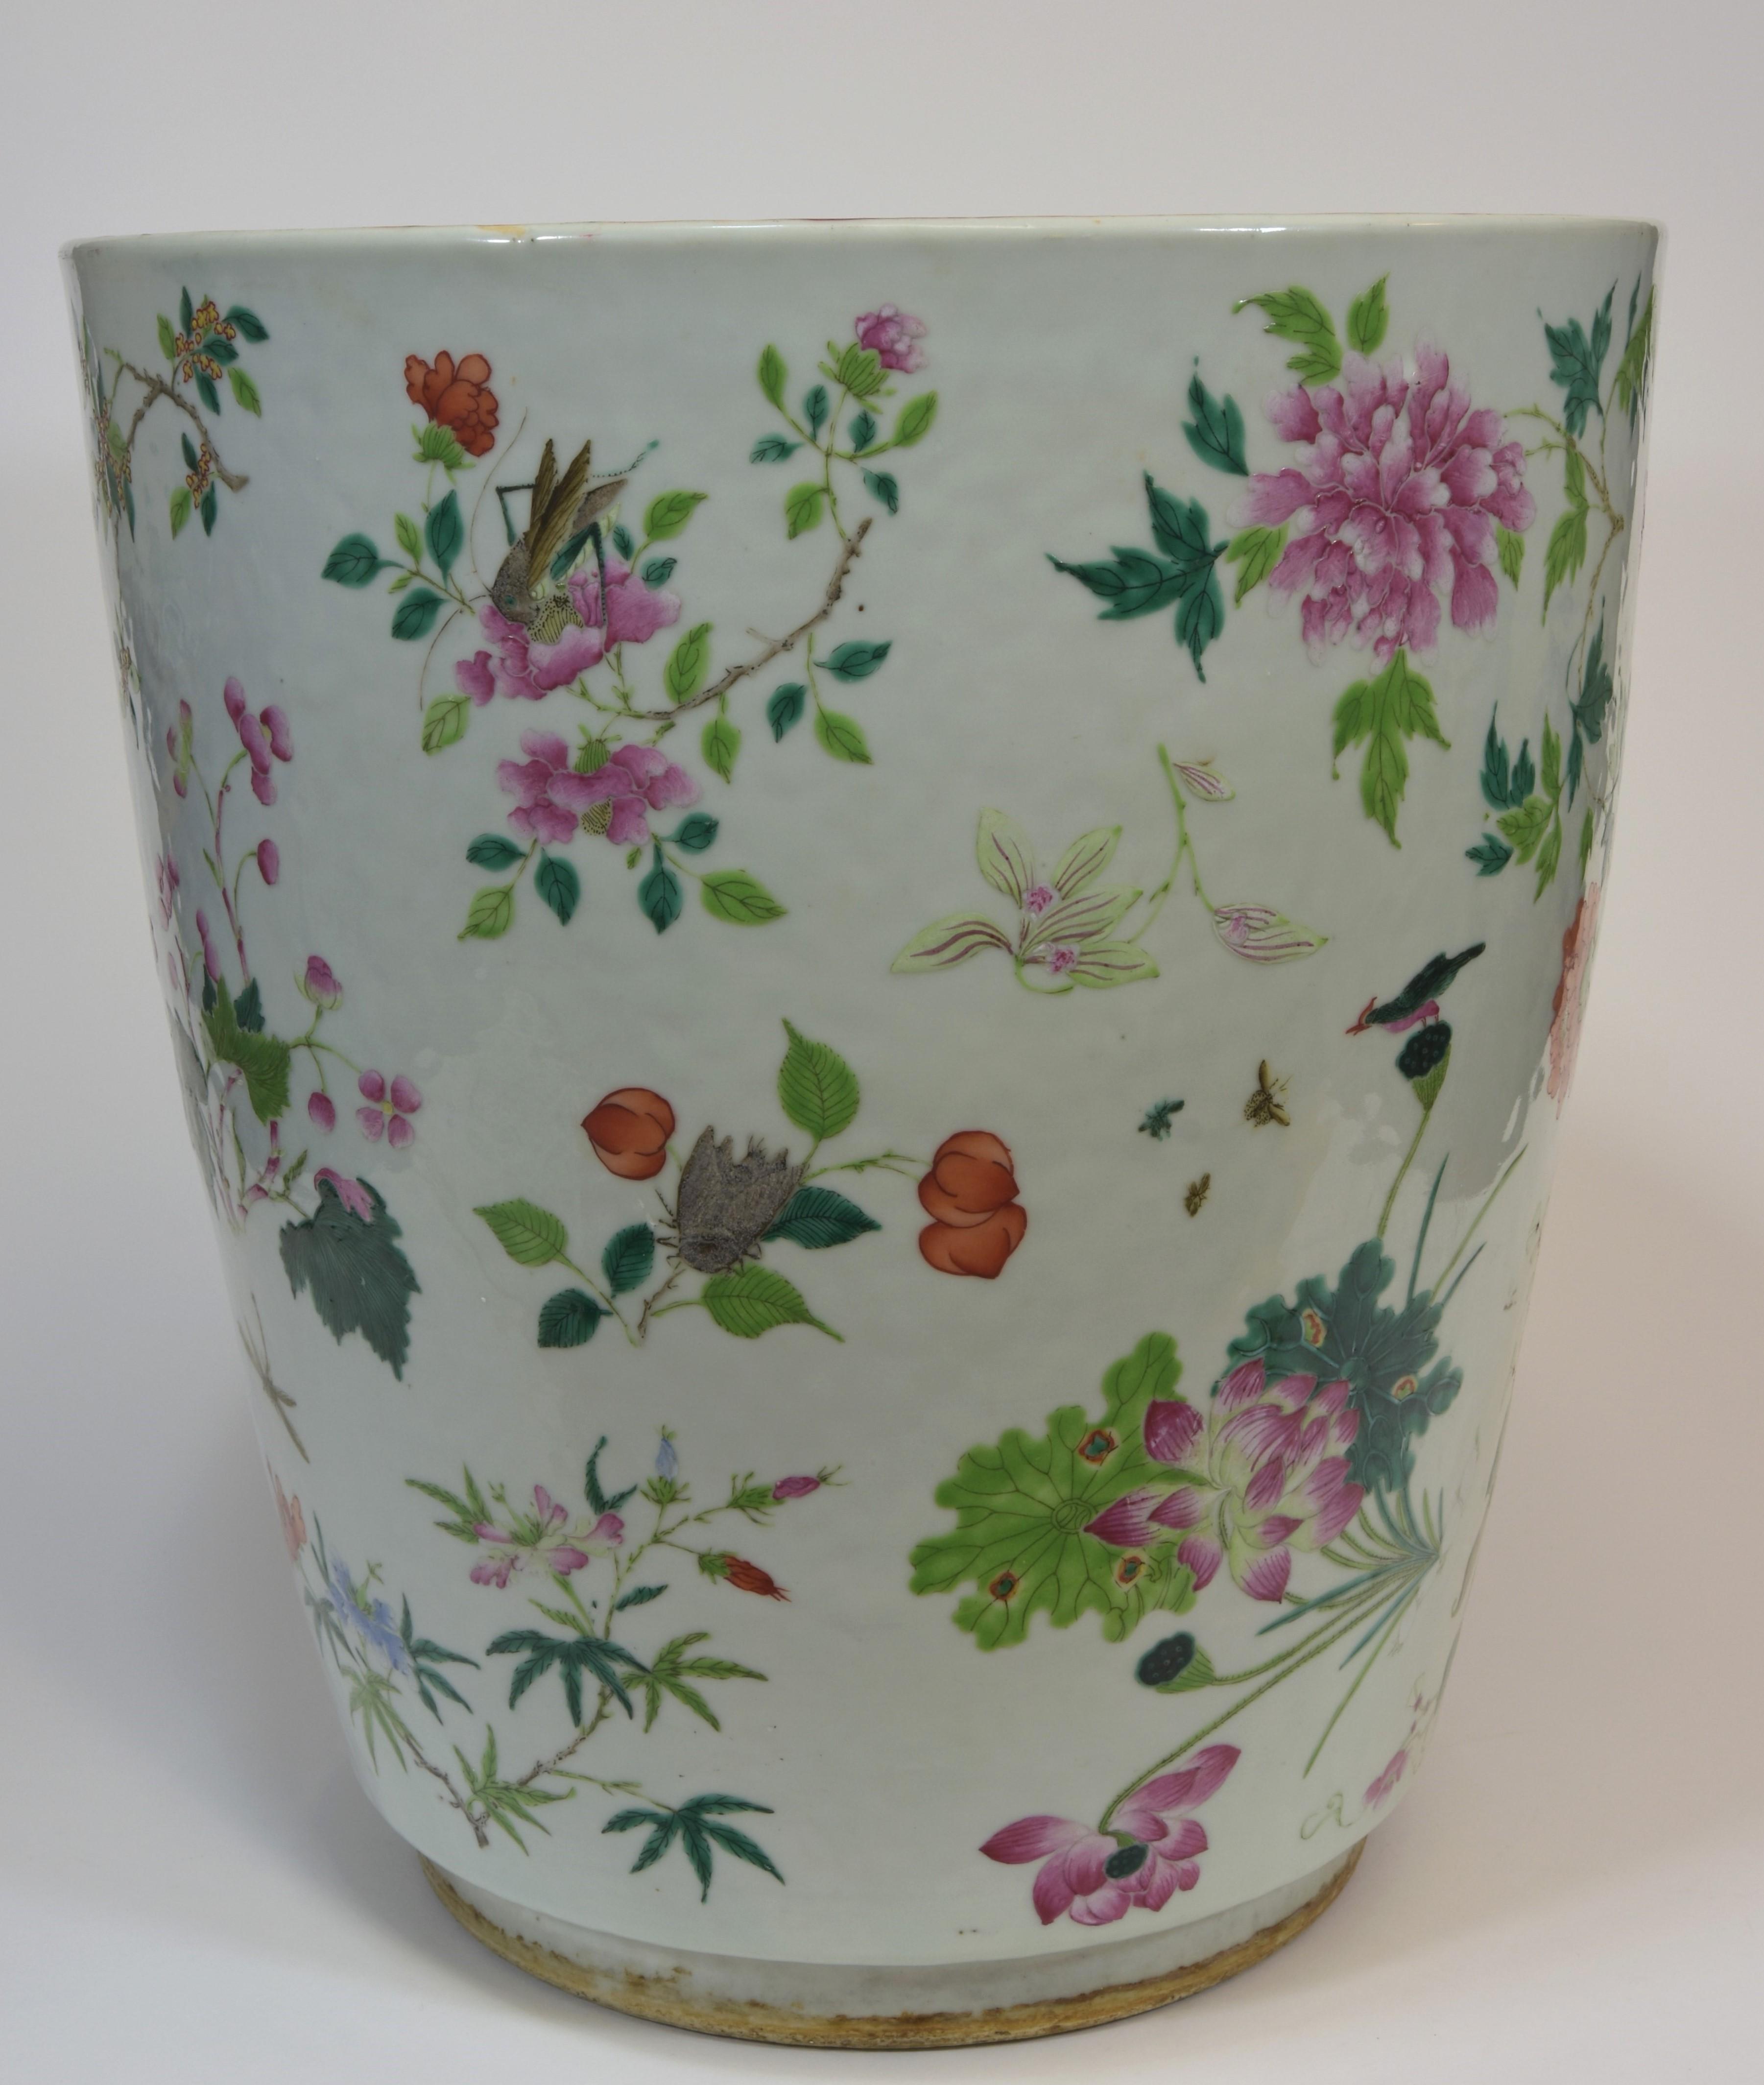 Lot 43 - A 19th century floral pot 42cm清 光緒時期 粉彩萬花盆